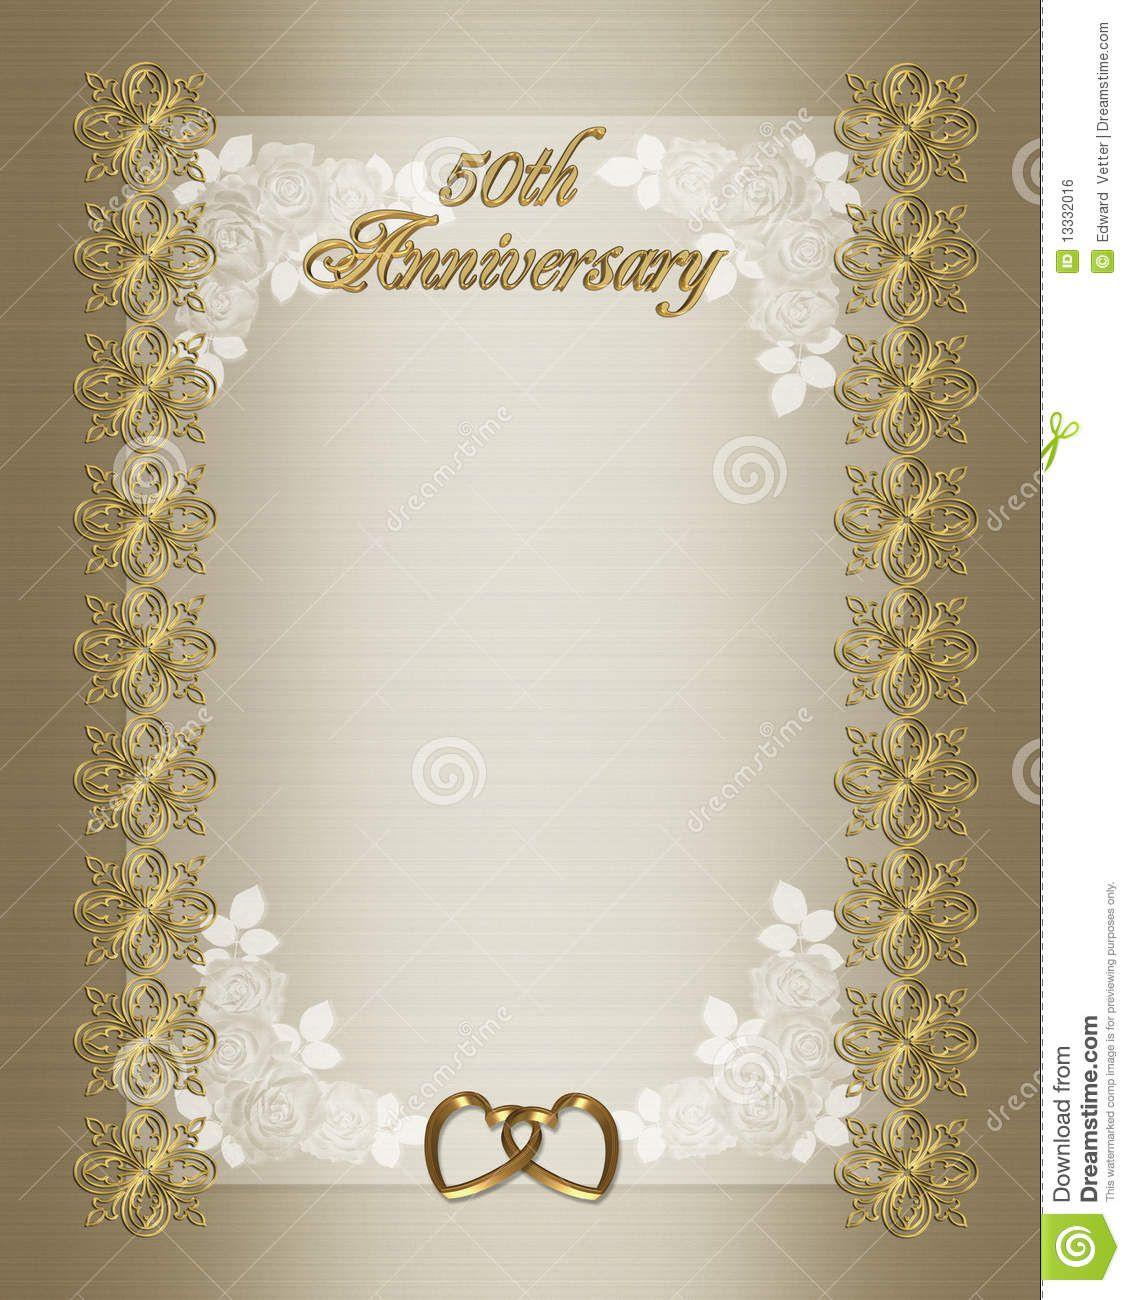 005 Fantastic Free 50th Wedding Anniversary Party Invitation Template Image  TemplatesFull